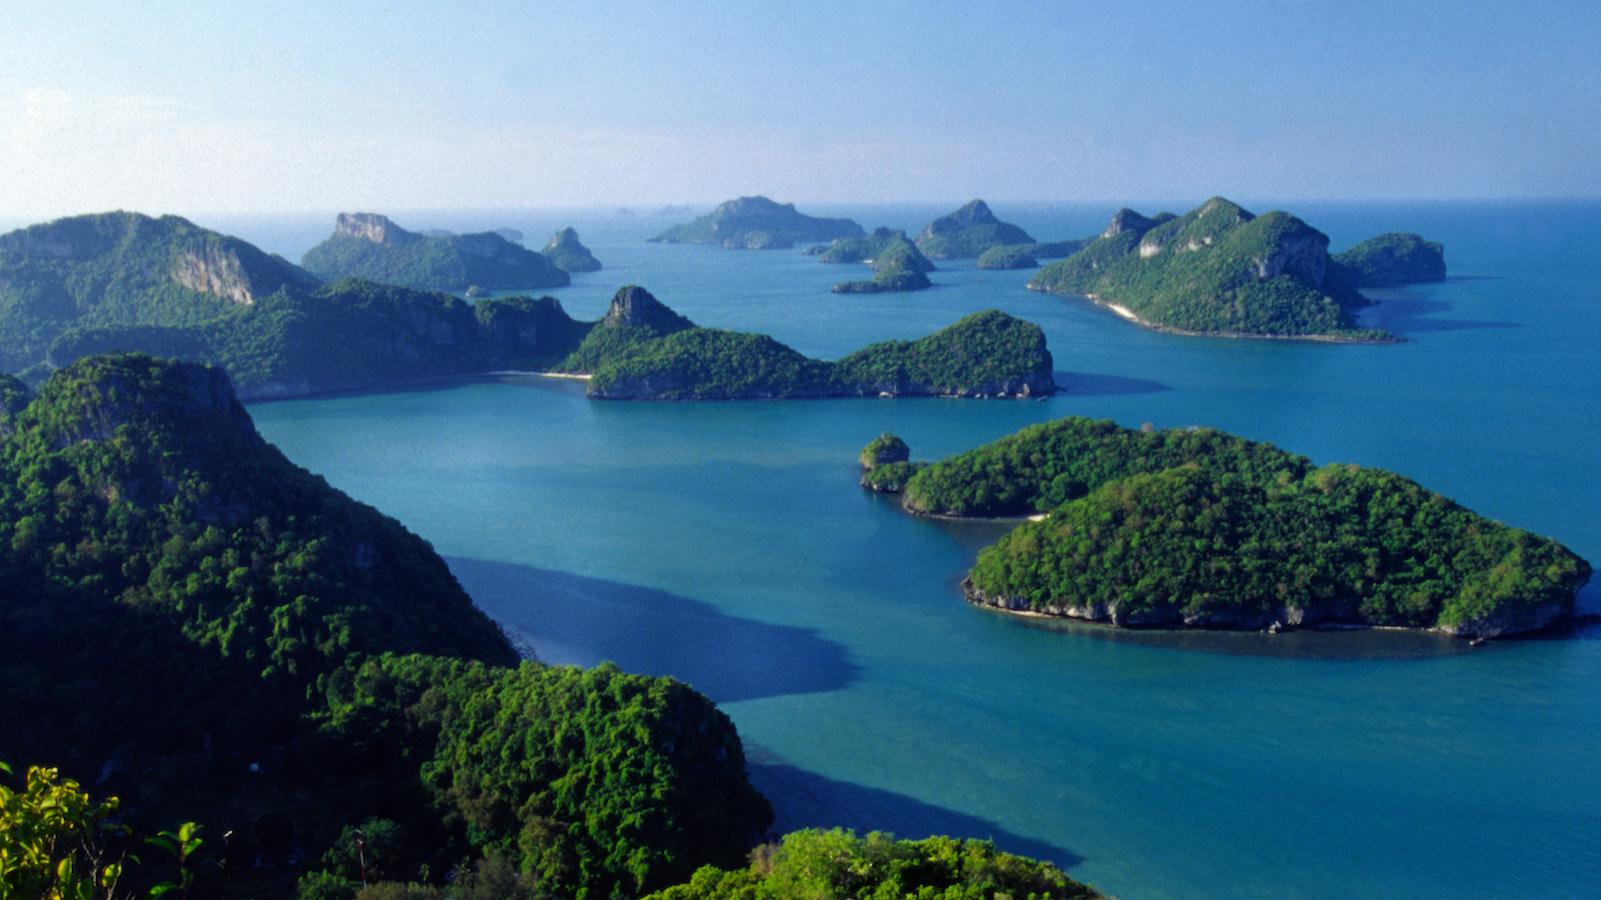 Koh Samui day trip: Thailand's Ang Thong National Marine Park | CNN Travel